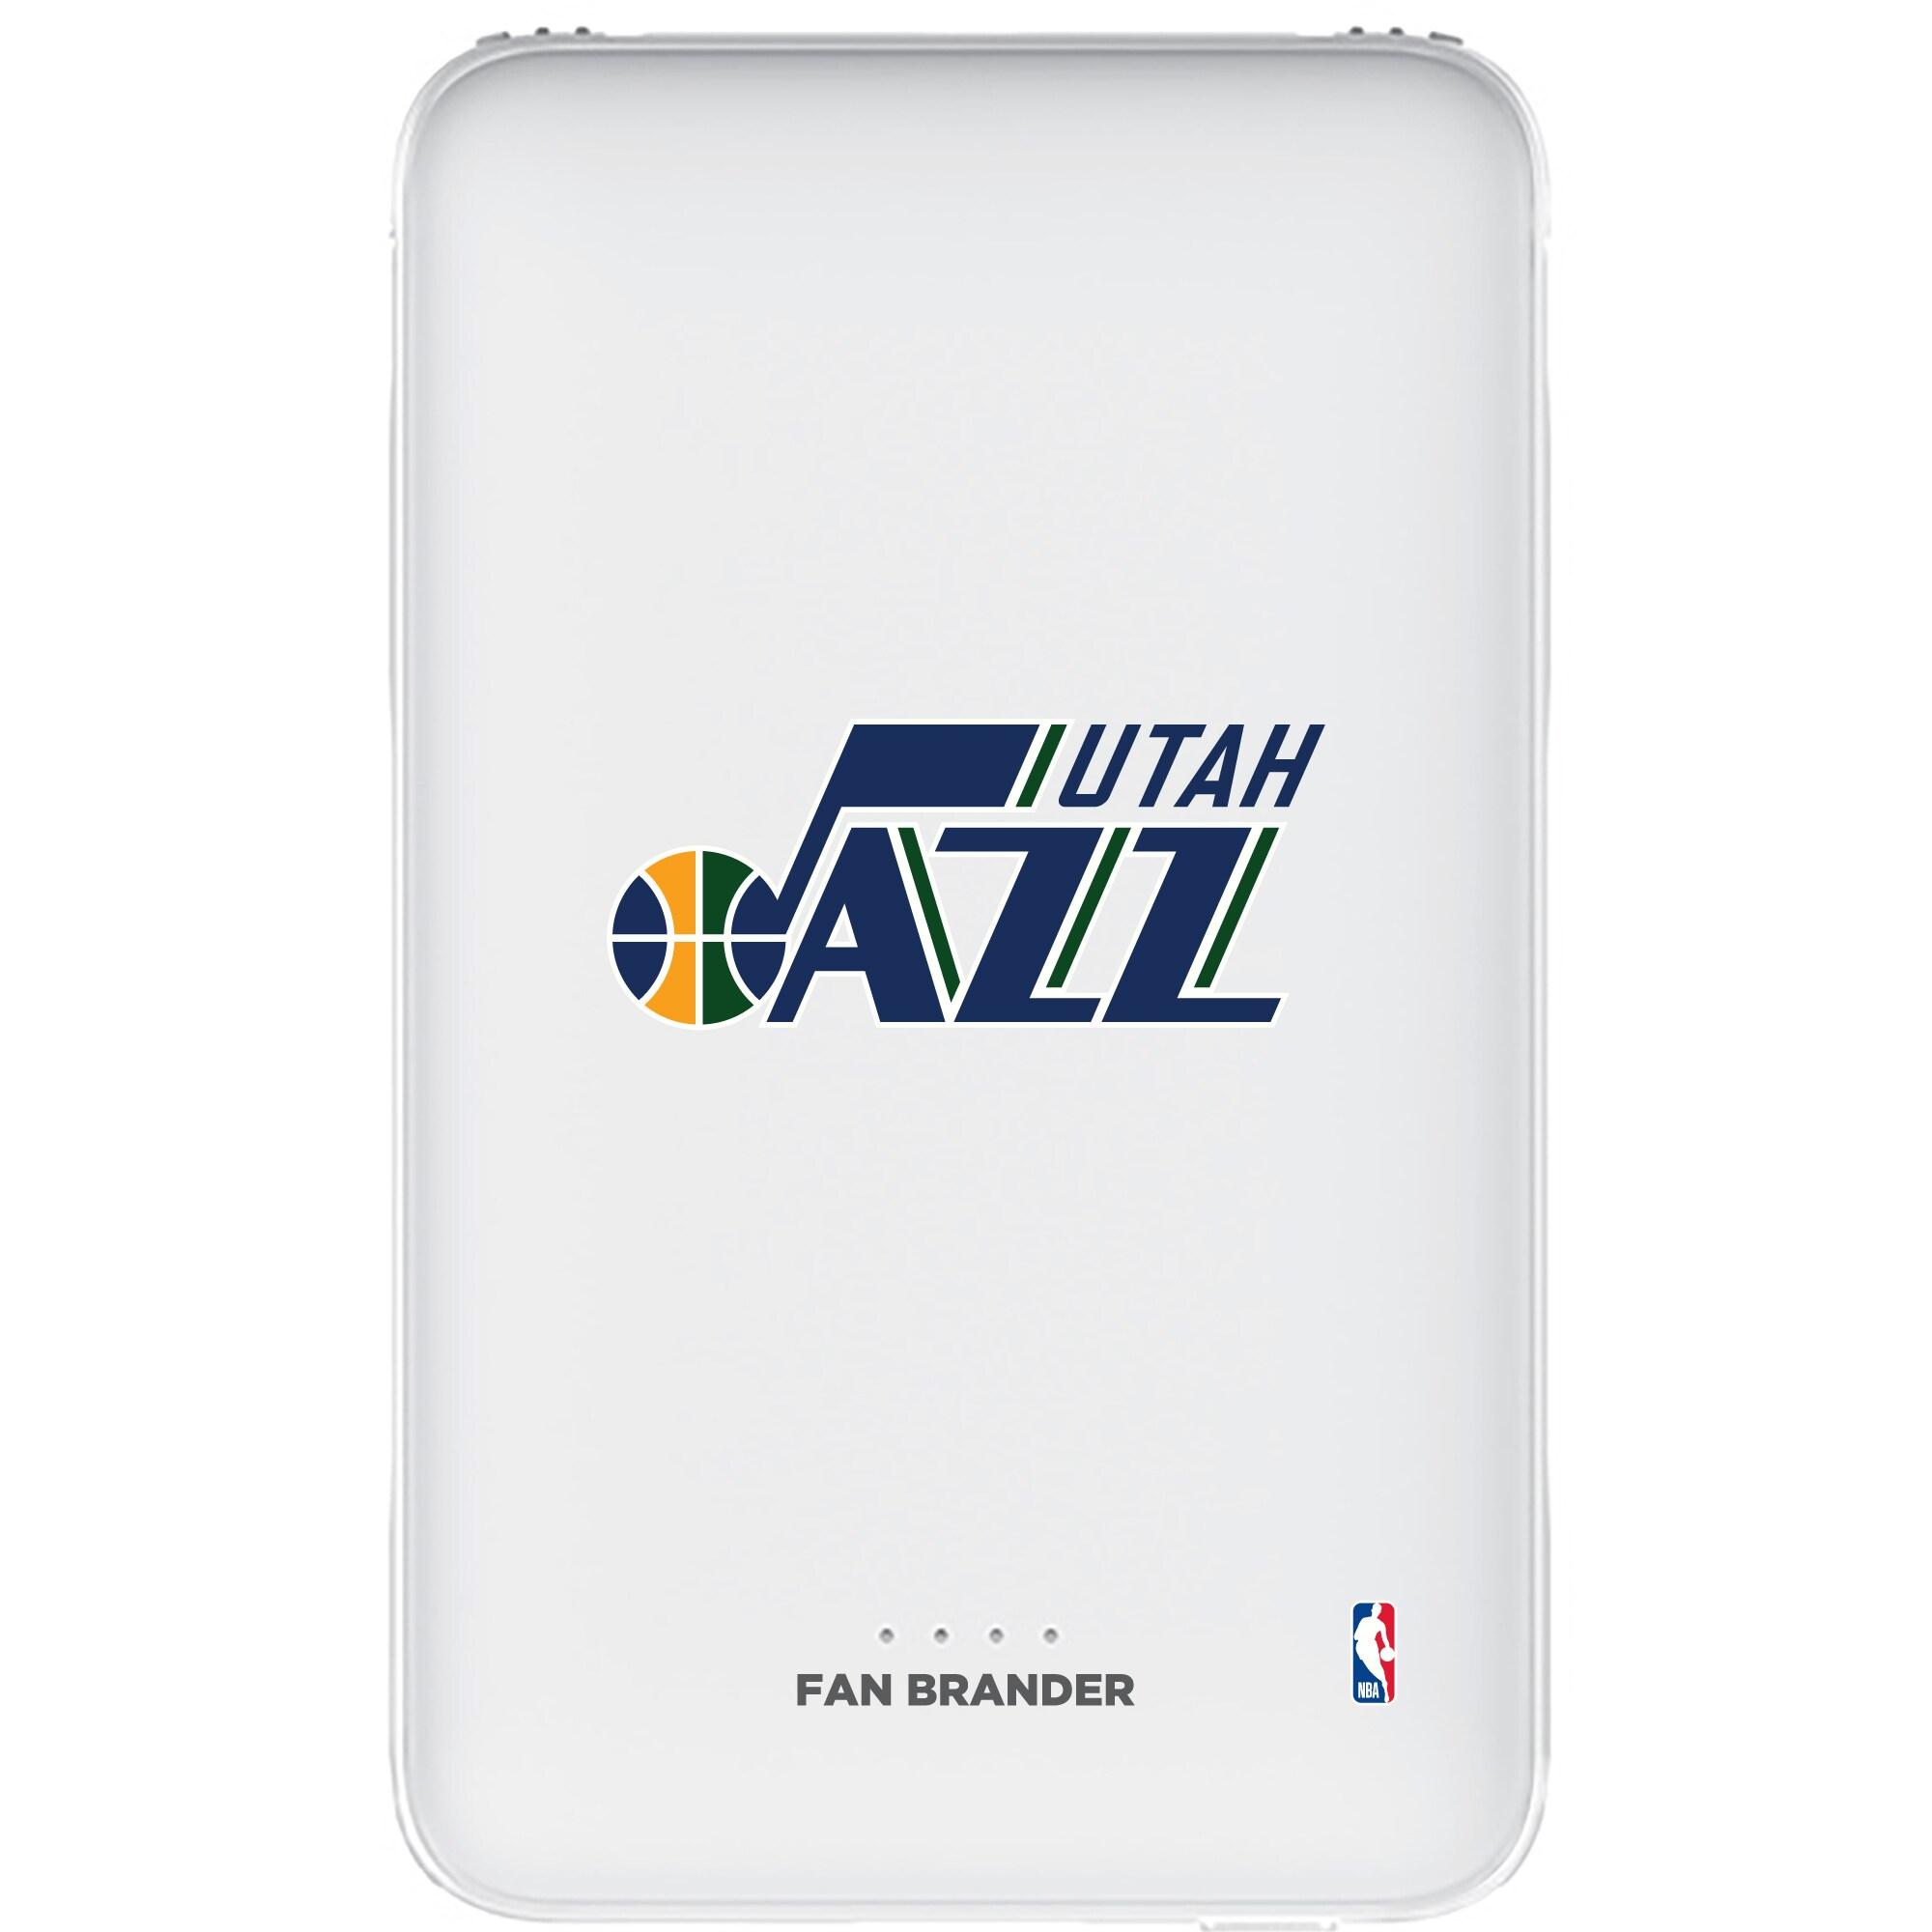 Utah Jazz 5000mAh Portable Power Bank - White